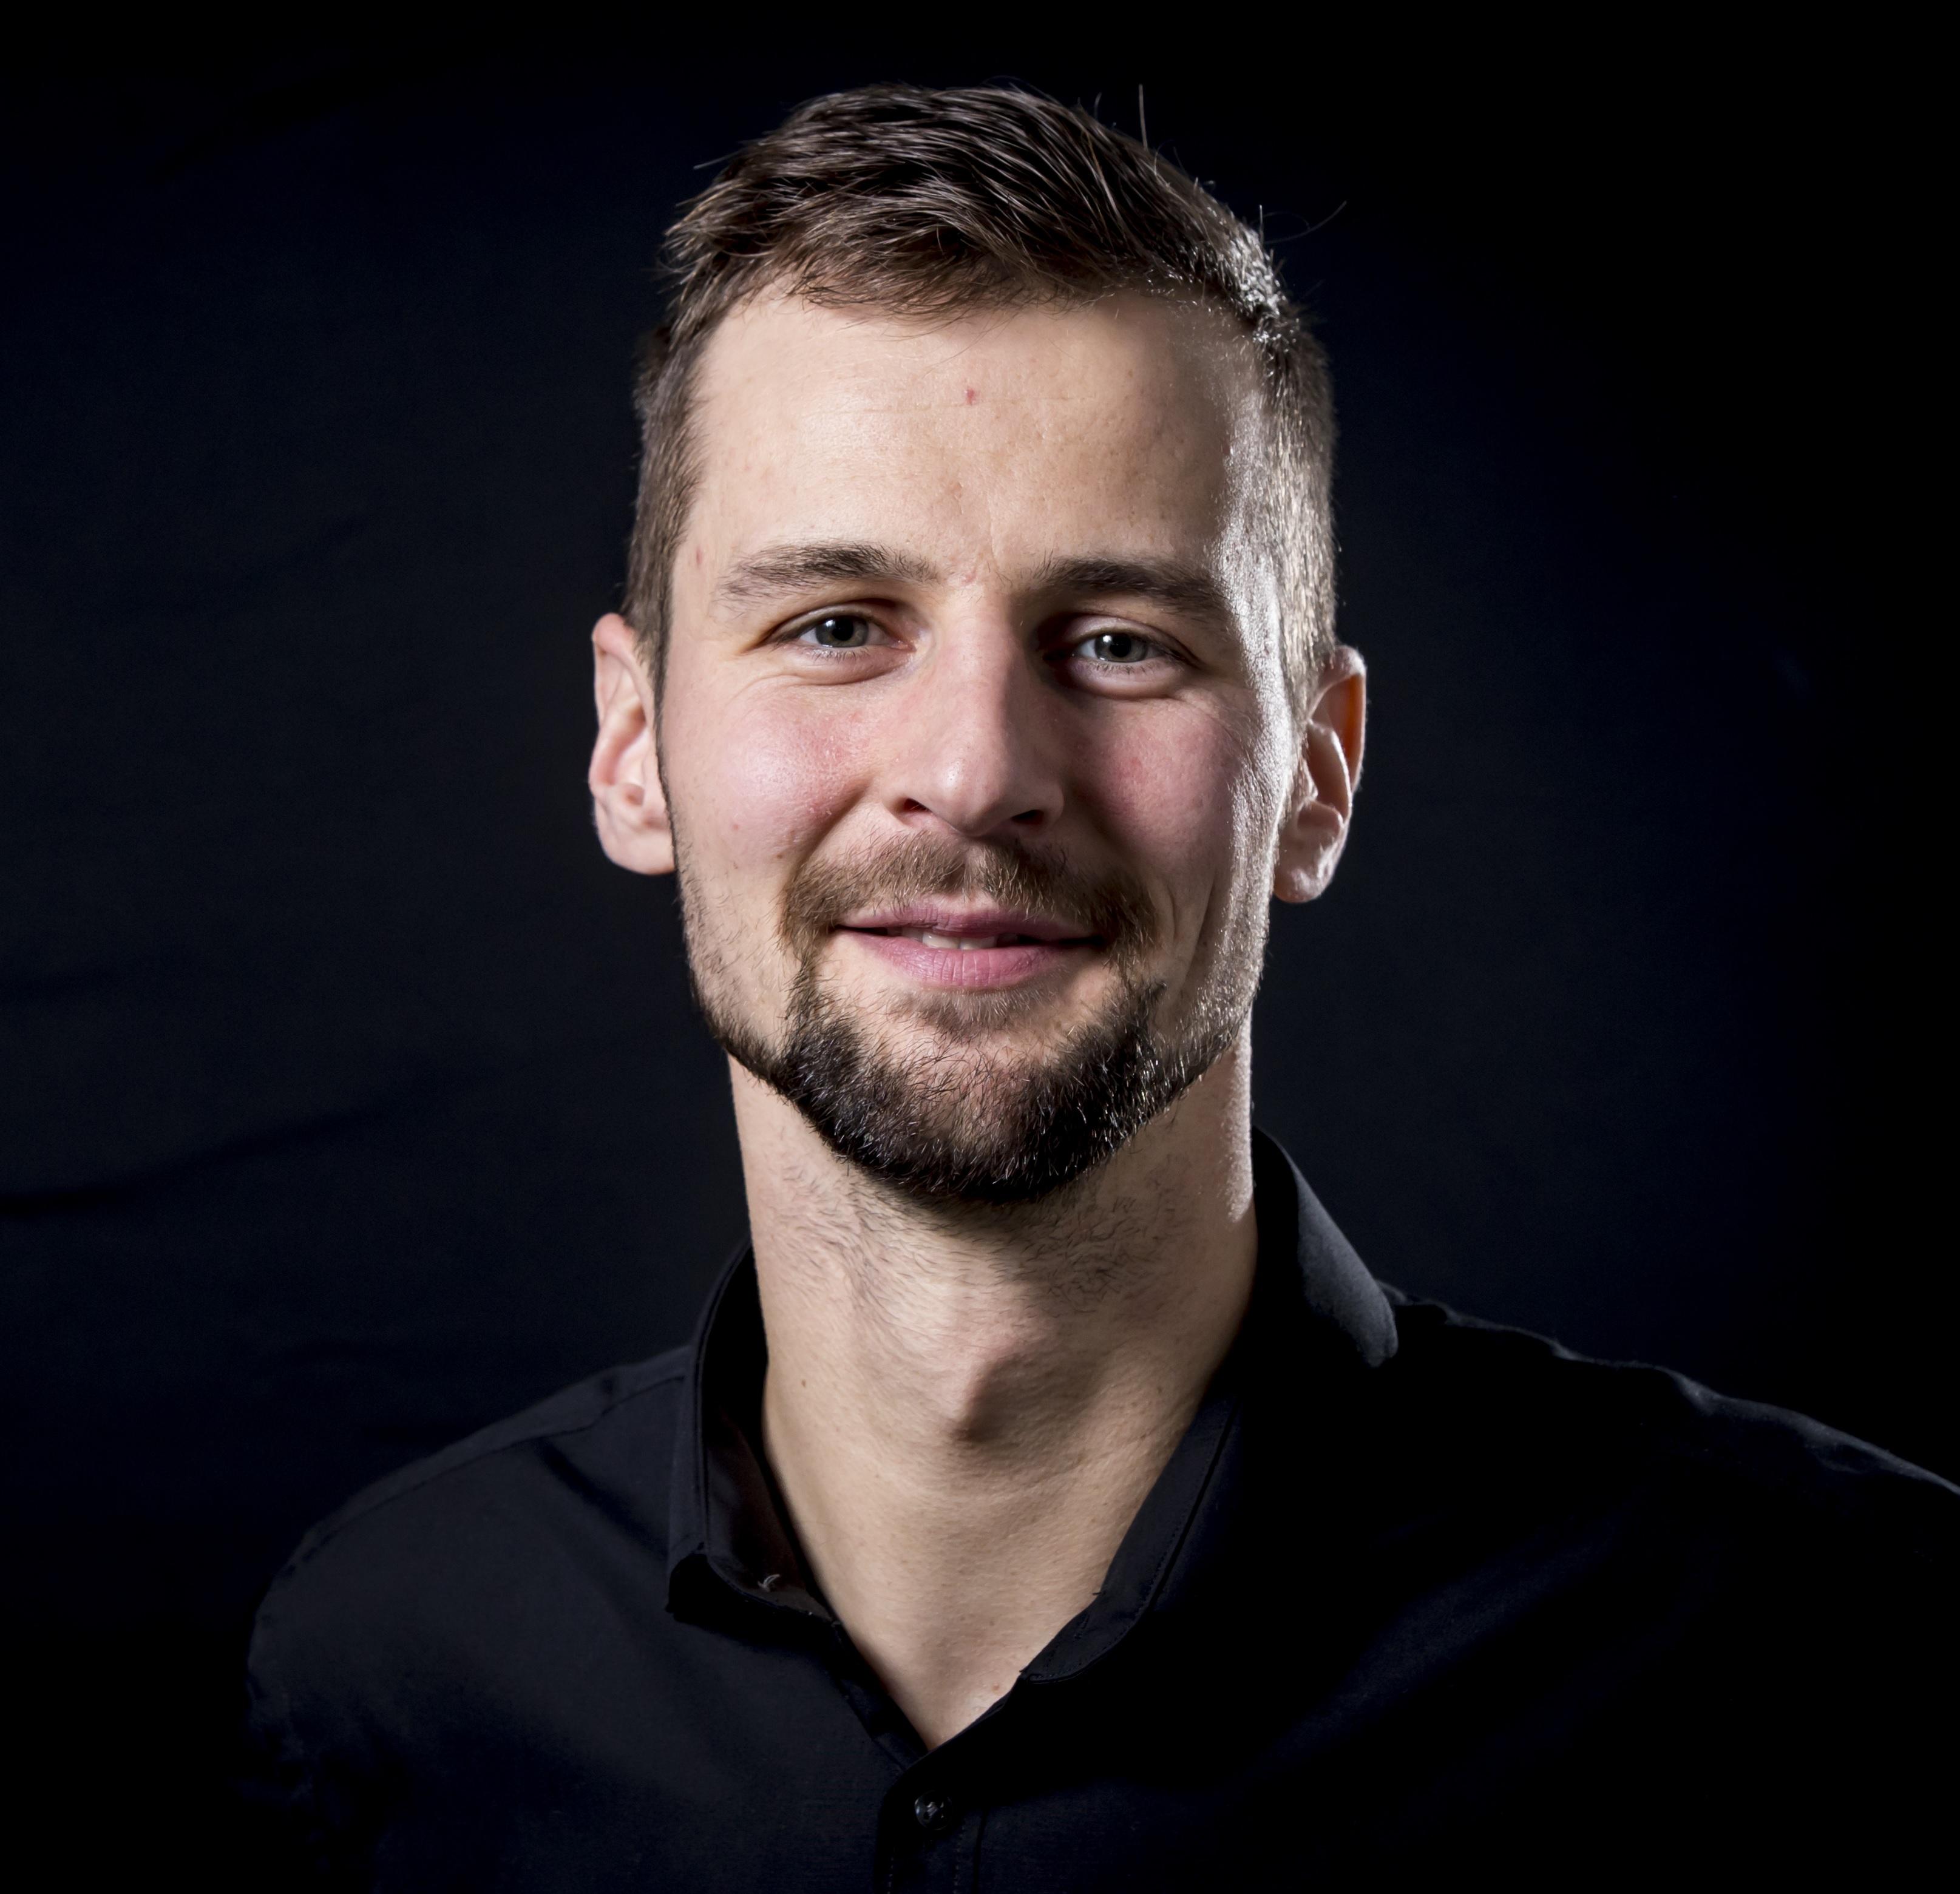 Arjen Jan van der Zee